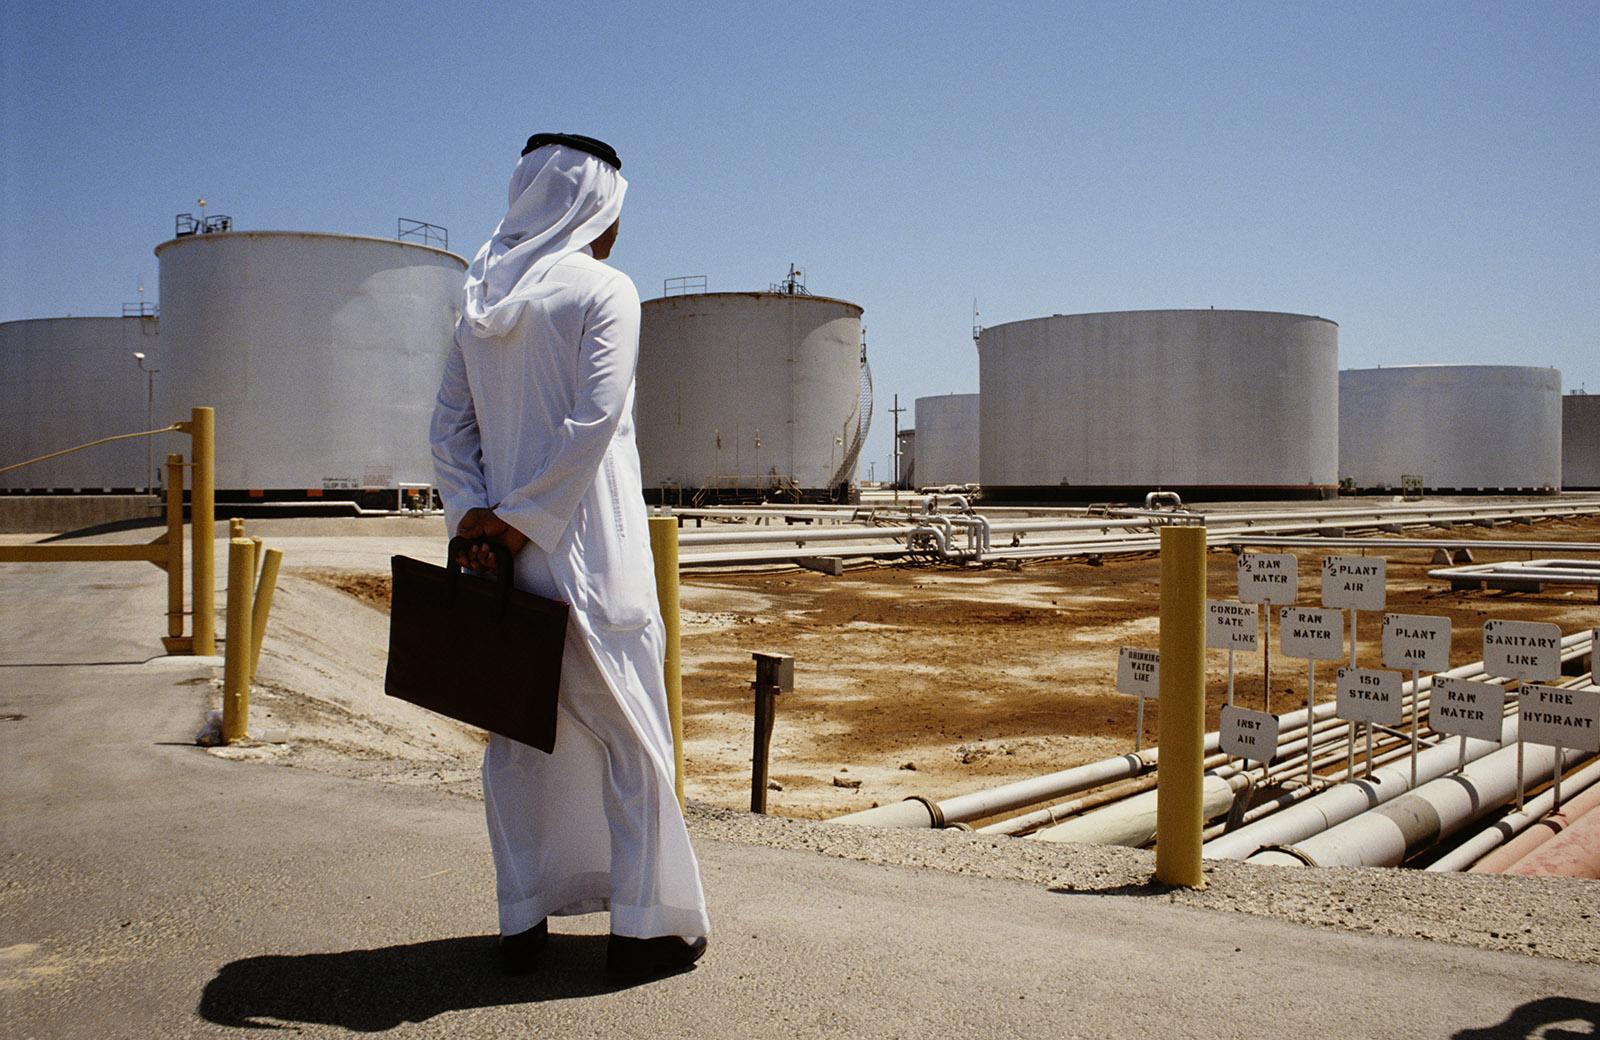 A view of the Aramco oil refinery in Saudi Arabia, 1990